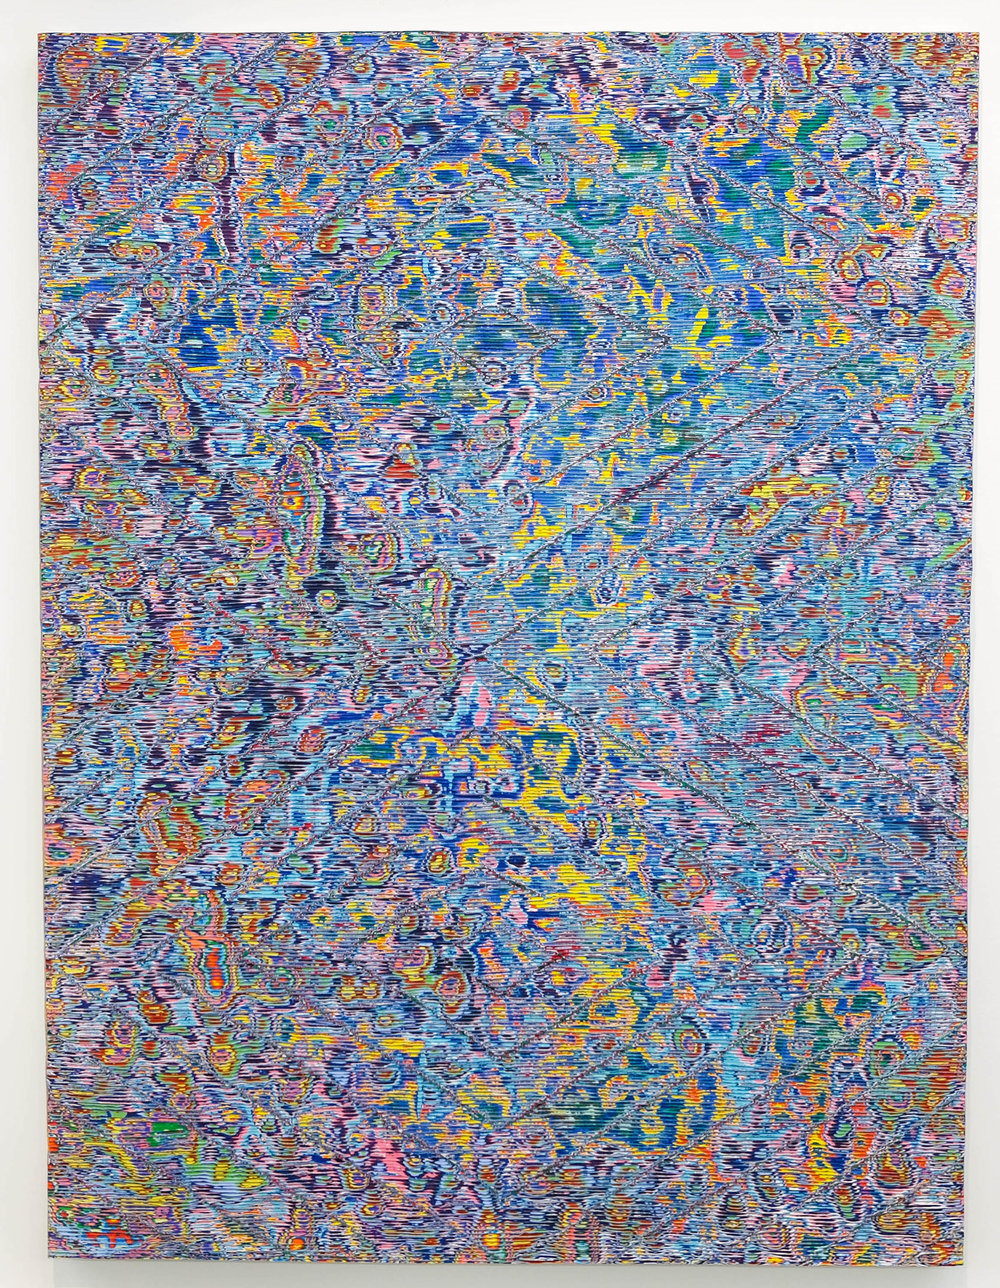 David Allan Peters  Untitled #2 , 2018 acrylic on wood panel 18 x 24 in (45.7 x 61 cm)